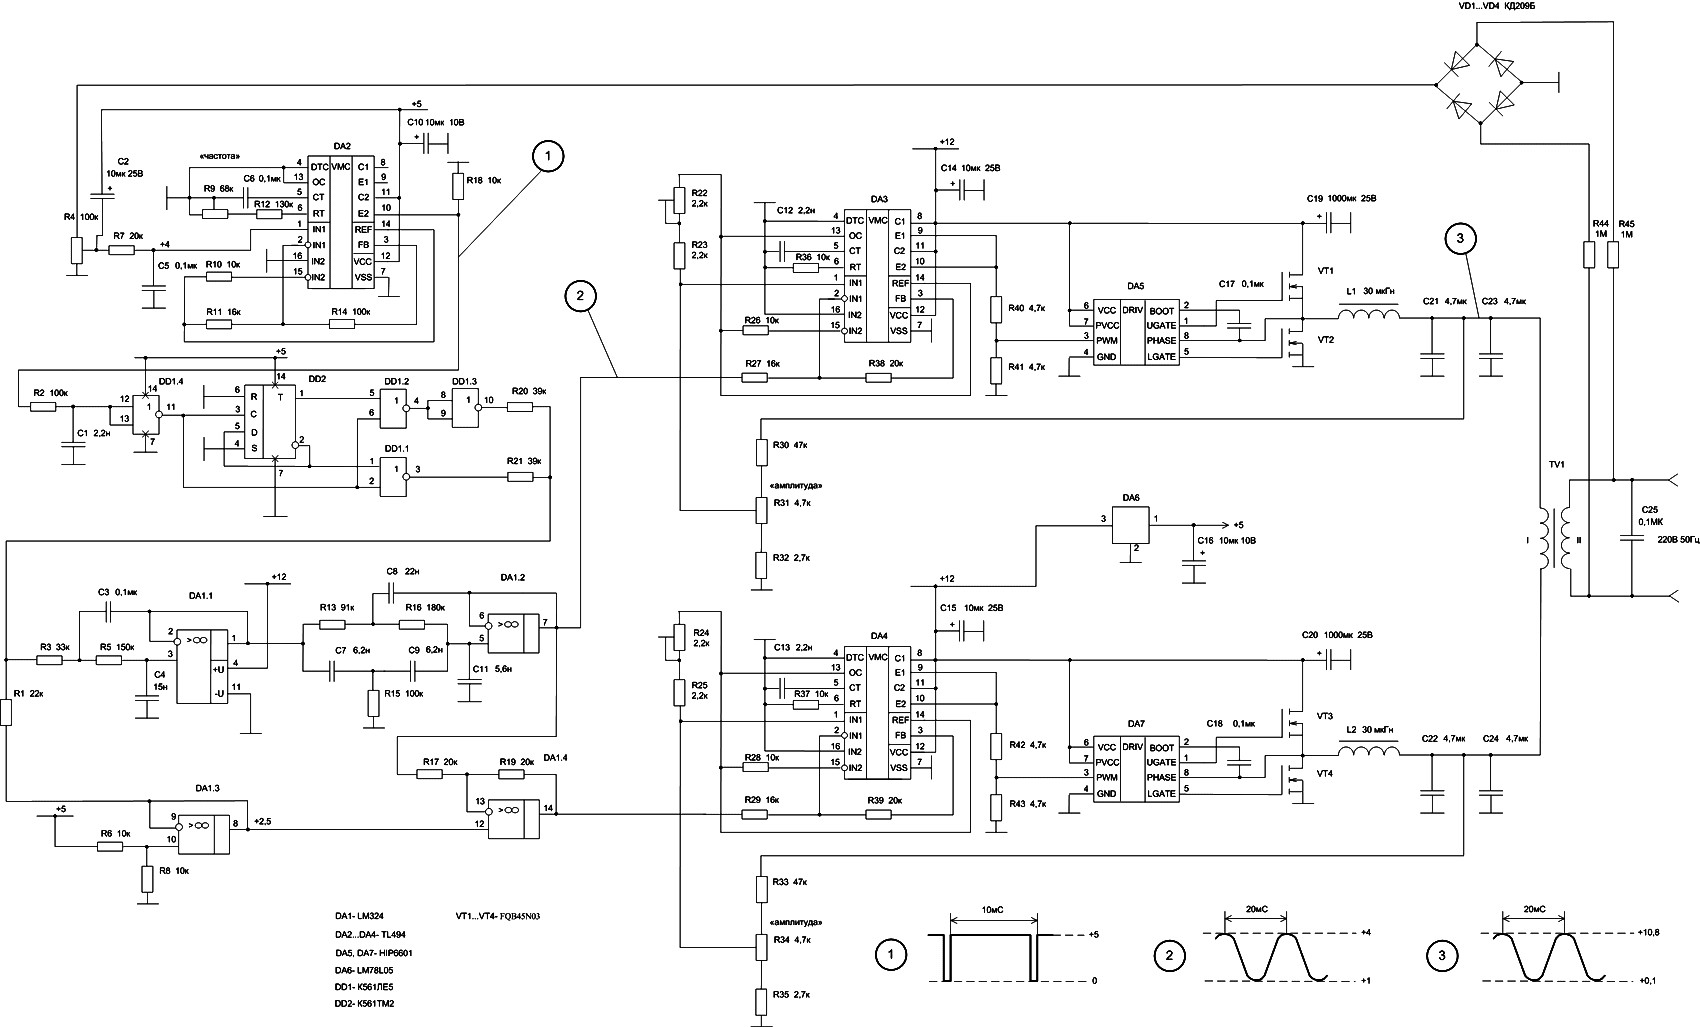 12vdc to 12vac converter circuit diagram 1998 toyota corolla alternator wiring 50w inverter 220vac based mosfet fqb45n03